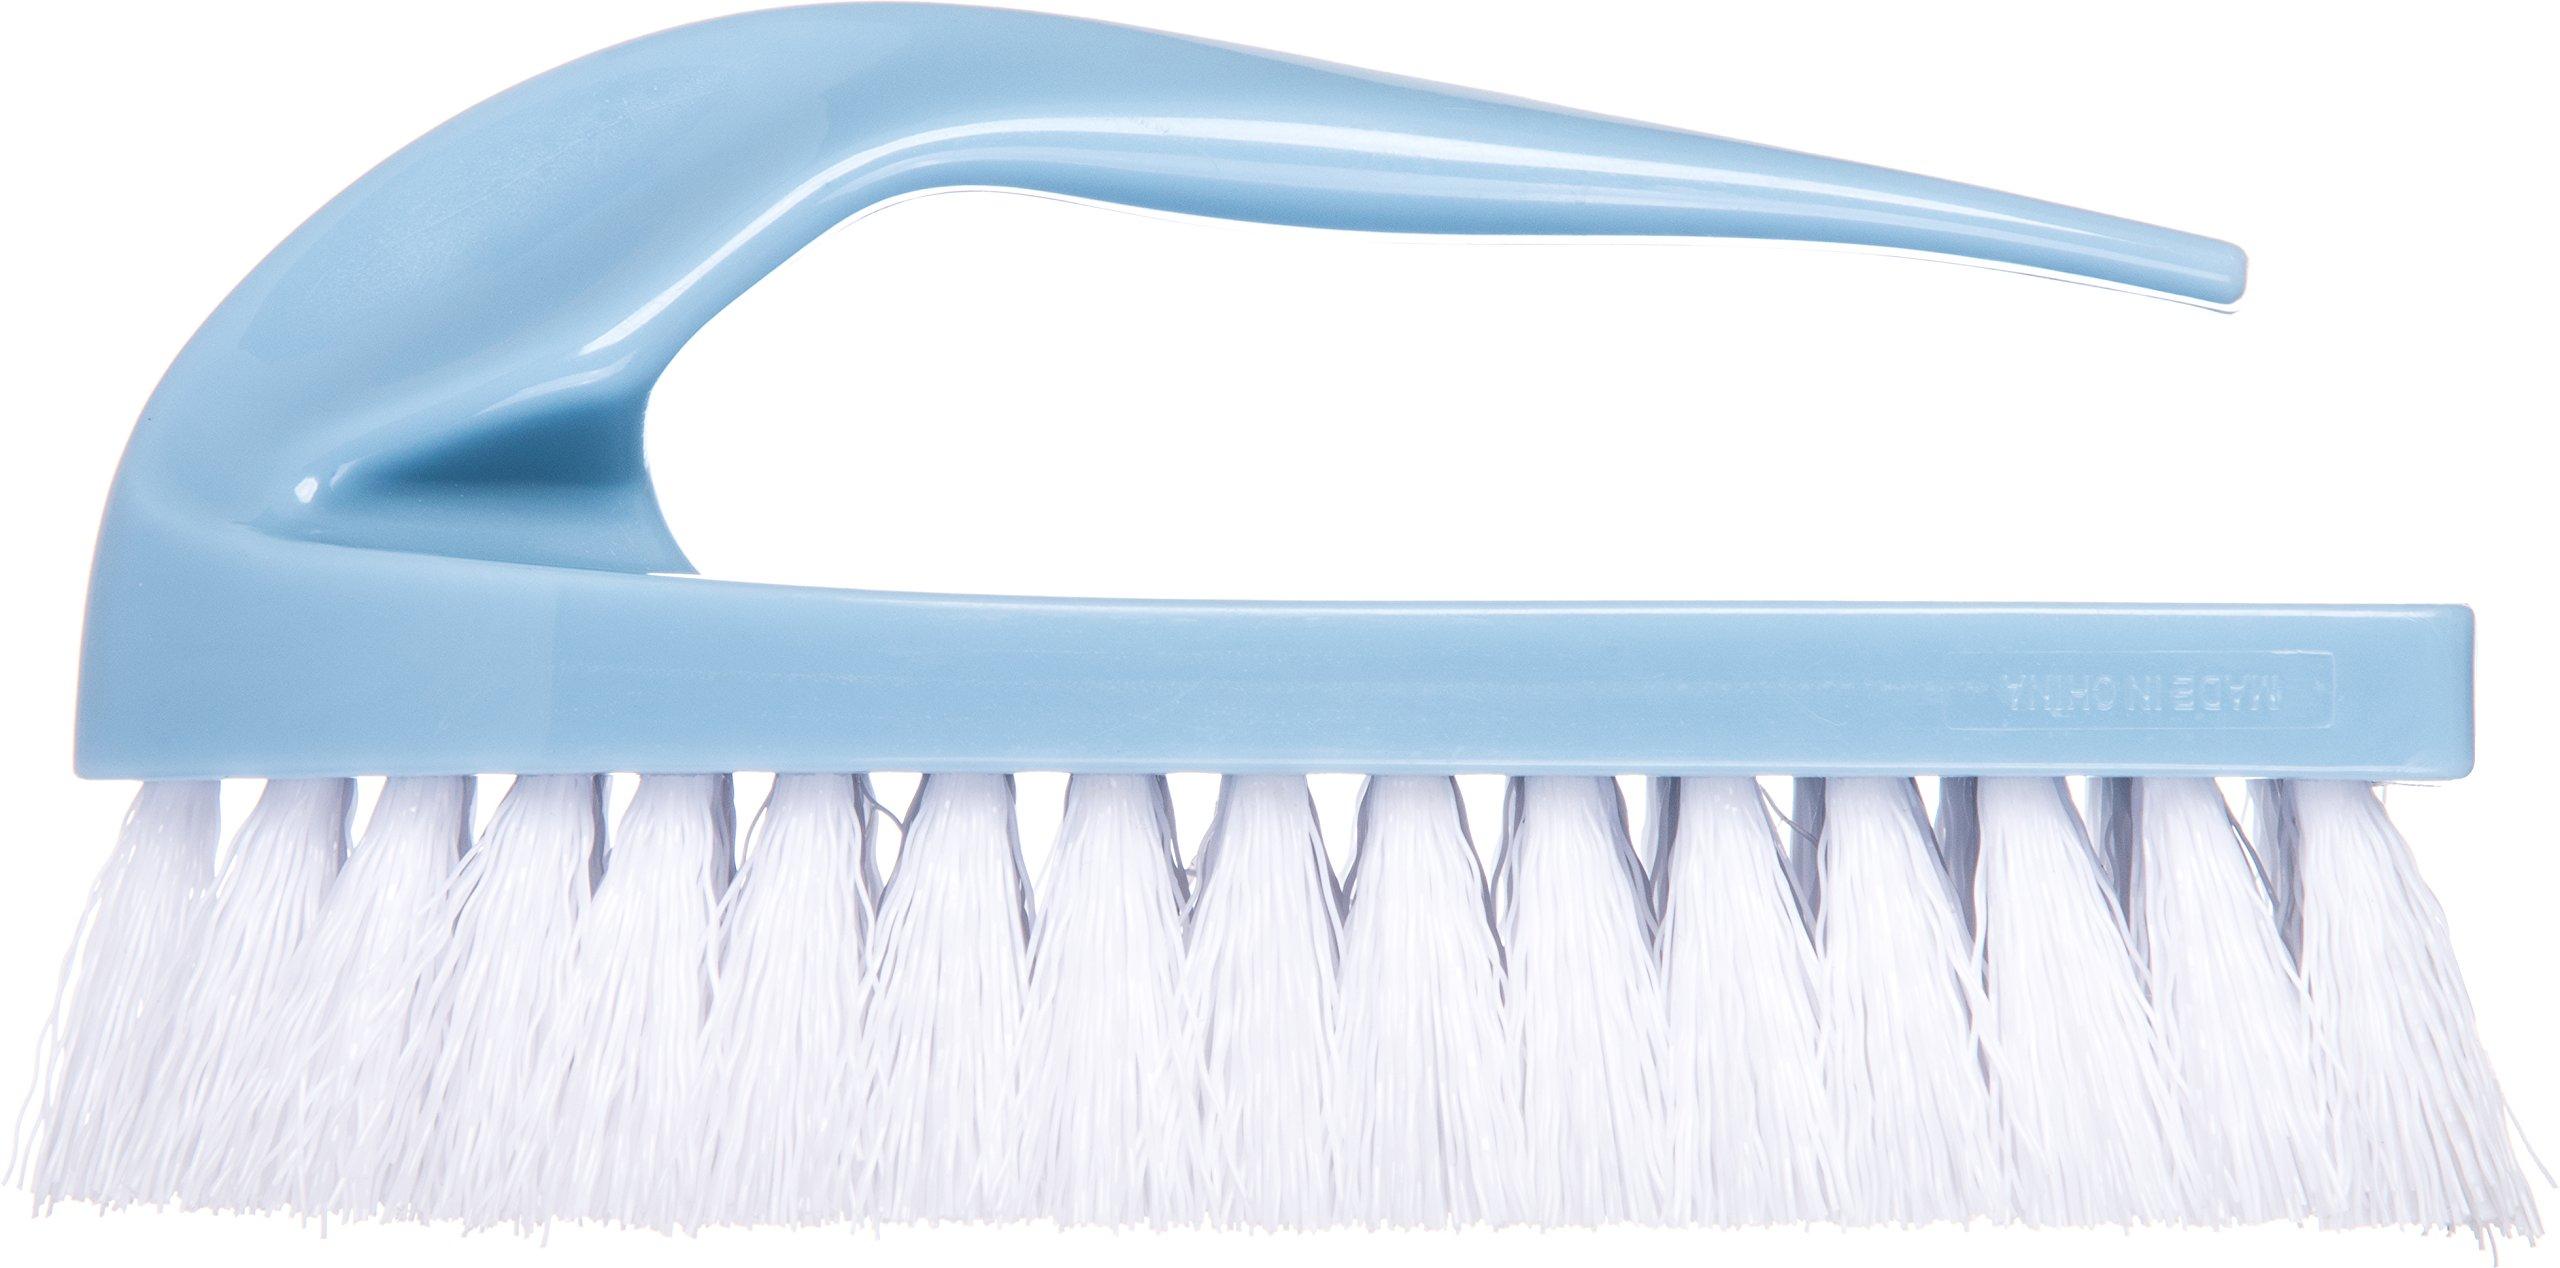 Carlisle 3628900 Iron-Style Handle Scrub Brush, Blue Plastic Block, 1''-Long White Polypropylene Bristles, 6'' L x 2-1/2'' W (Case of 48)